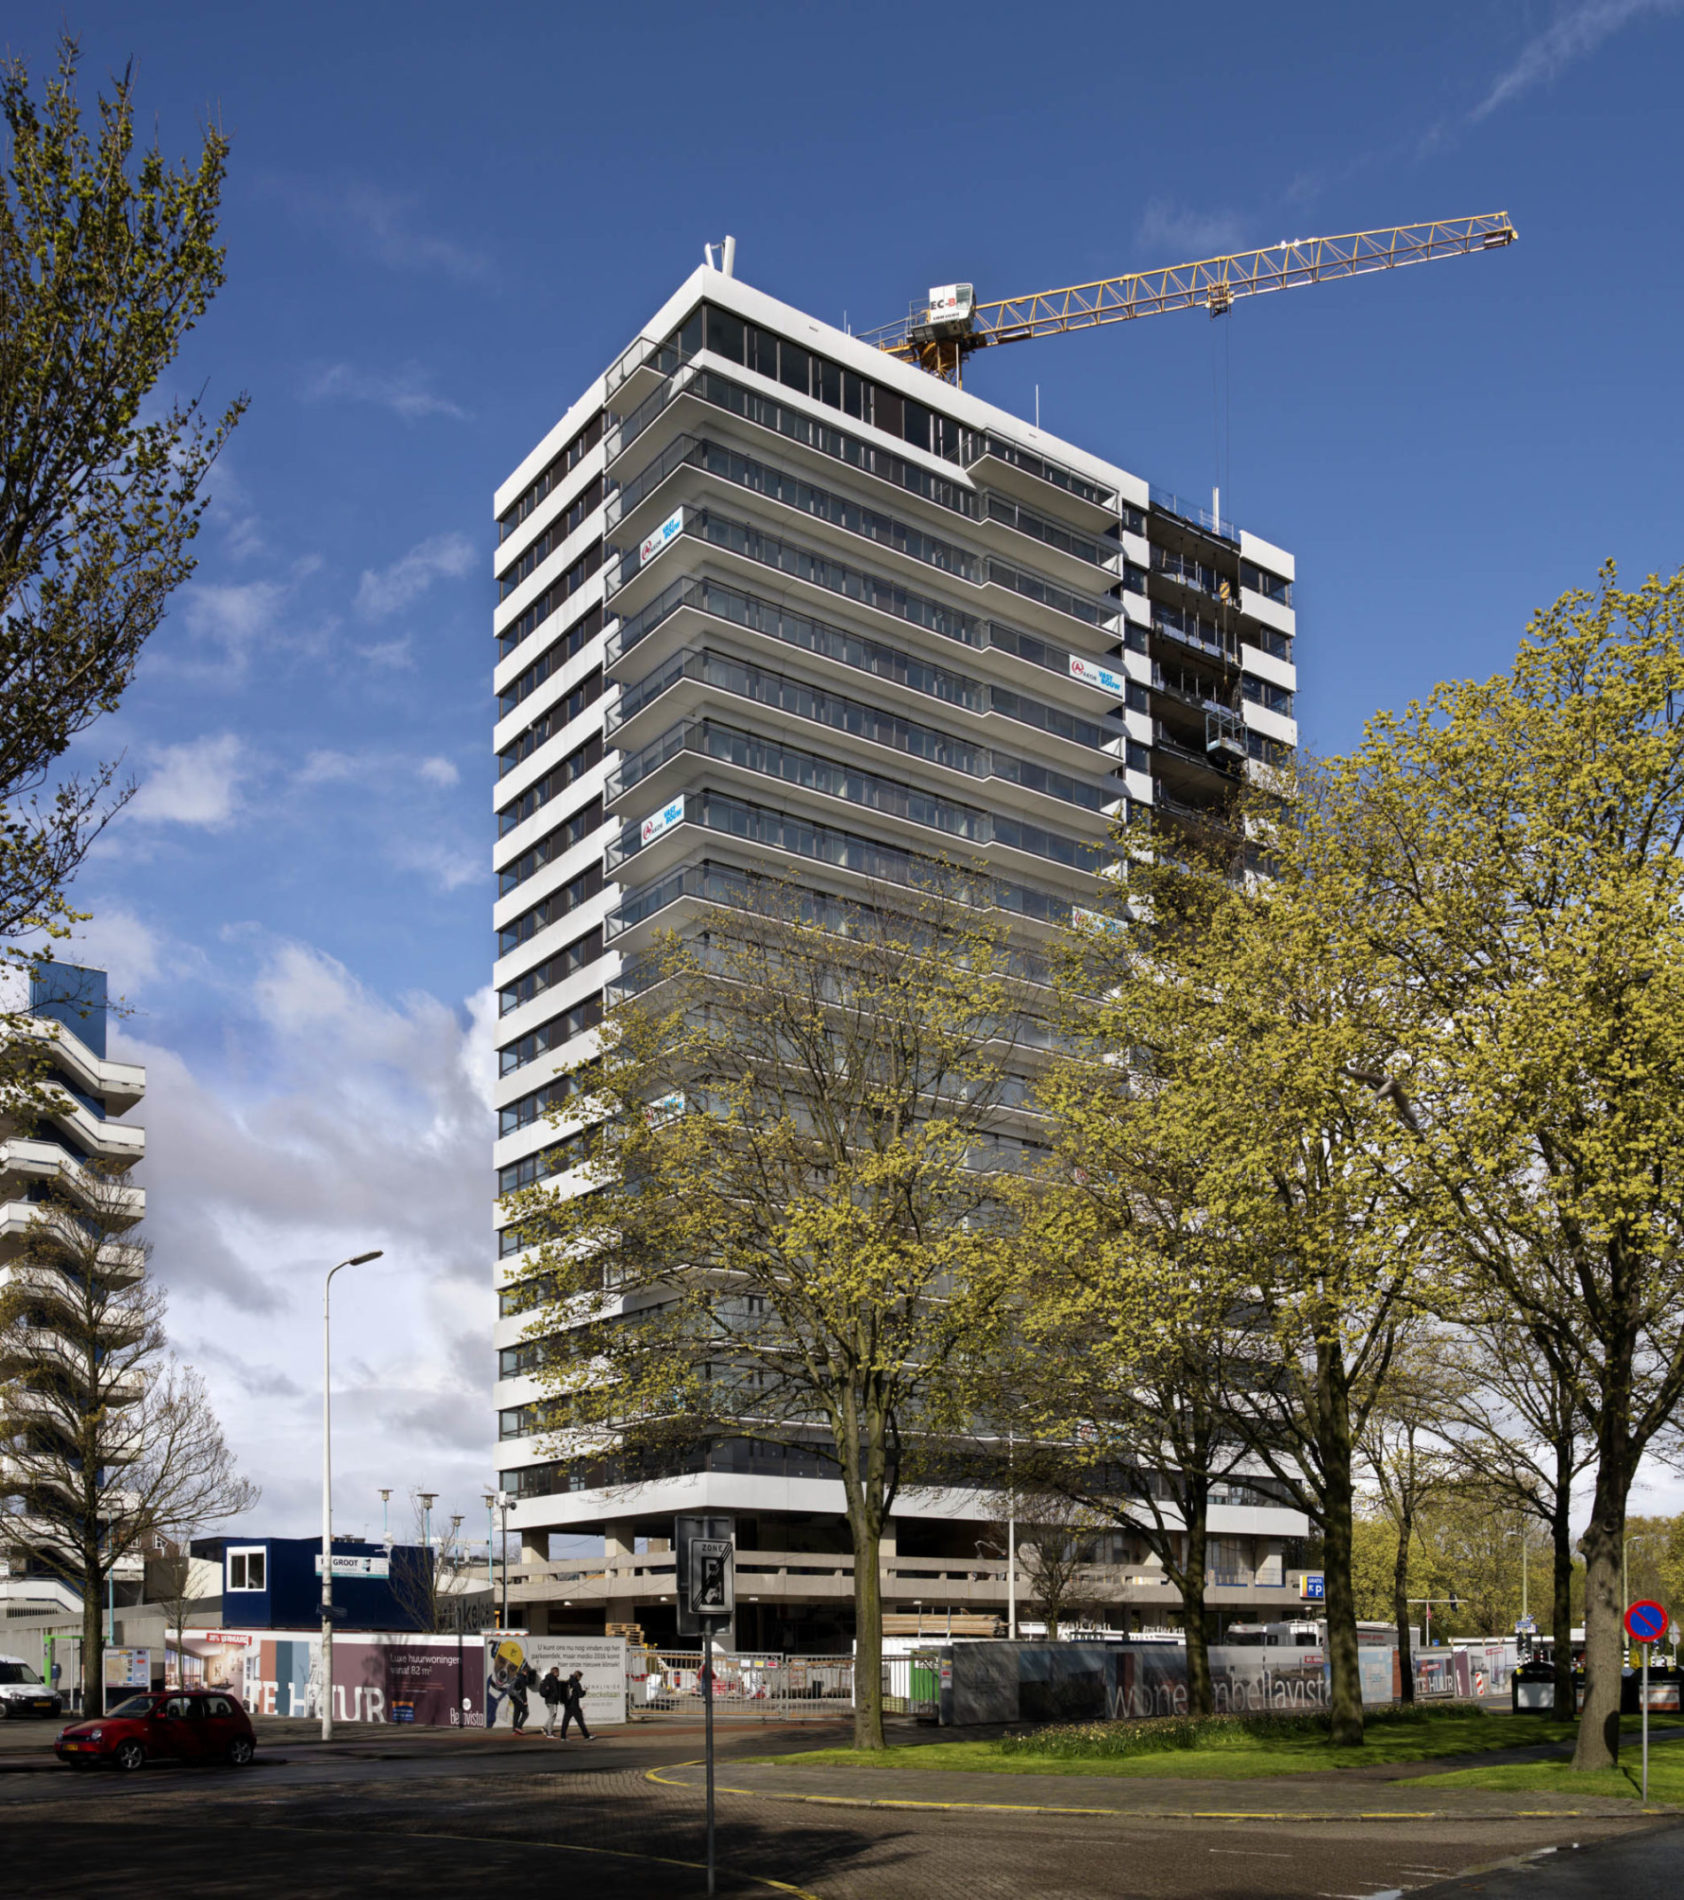 Treublaan Den Haag 26 04 2016_0030 LR